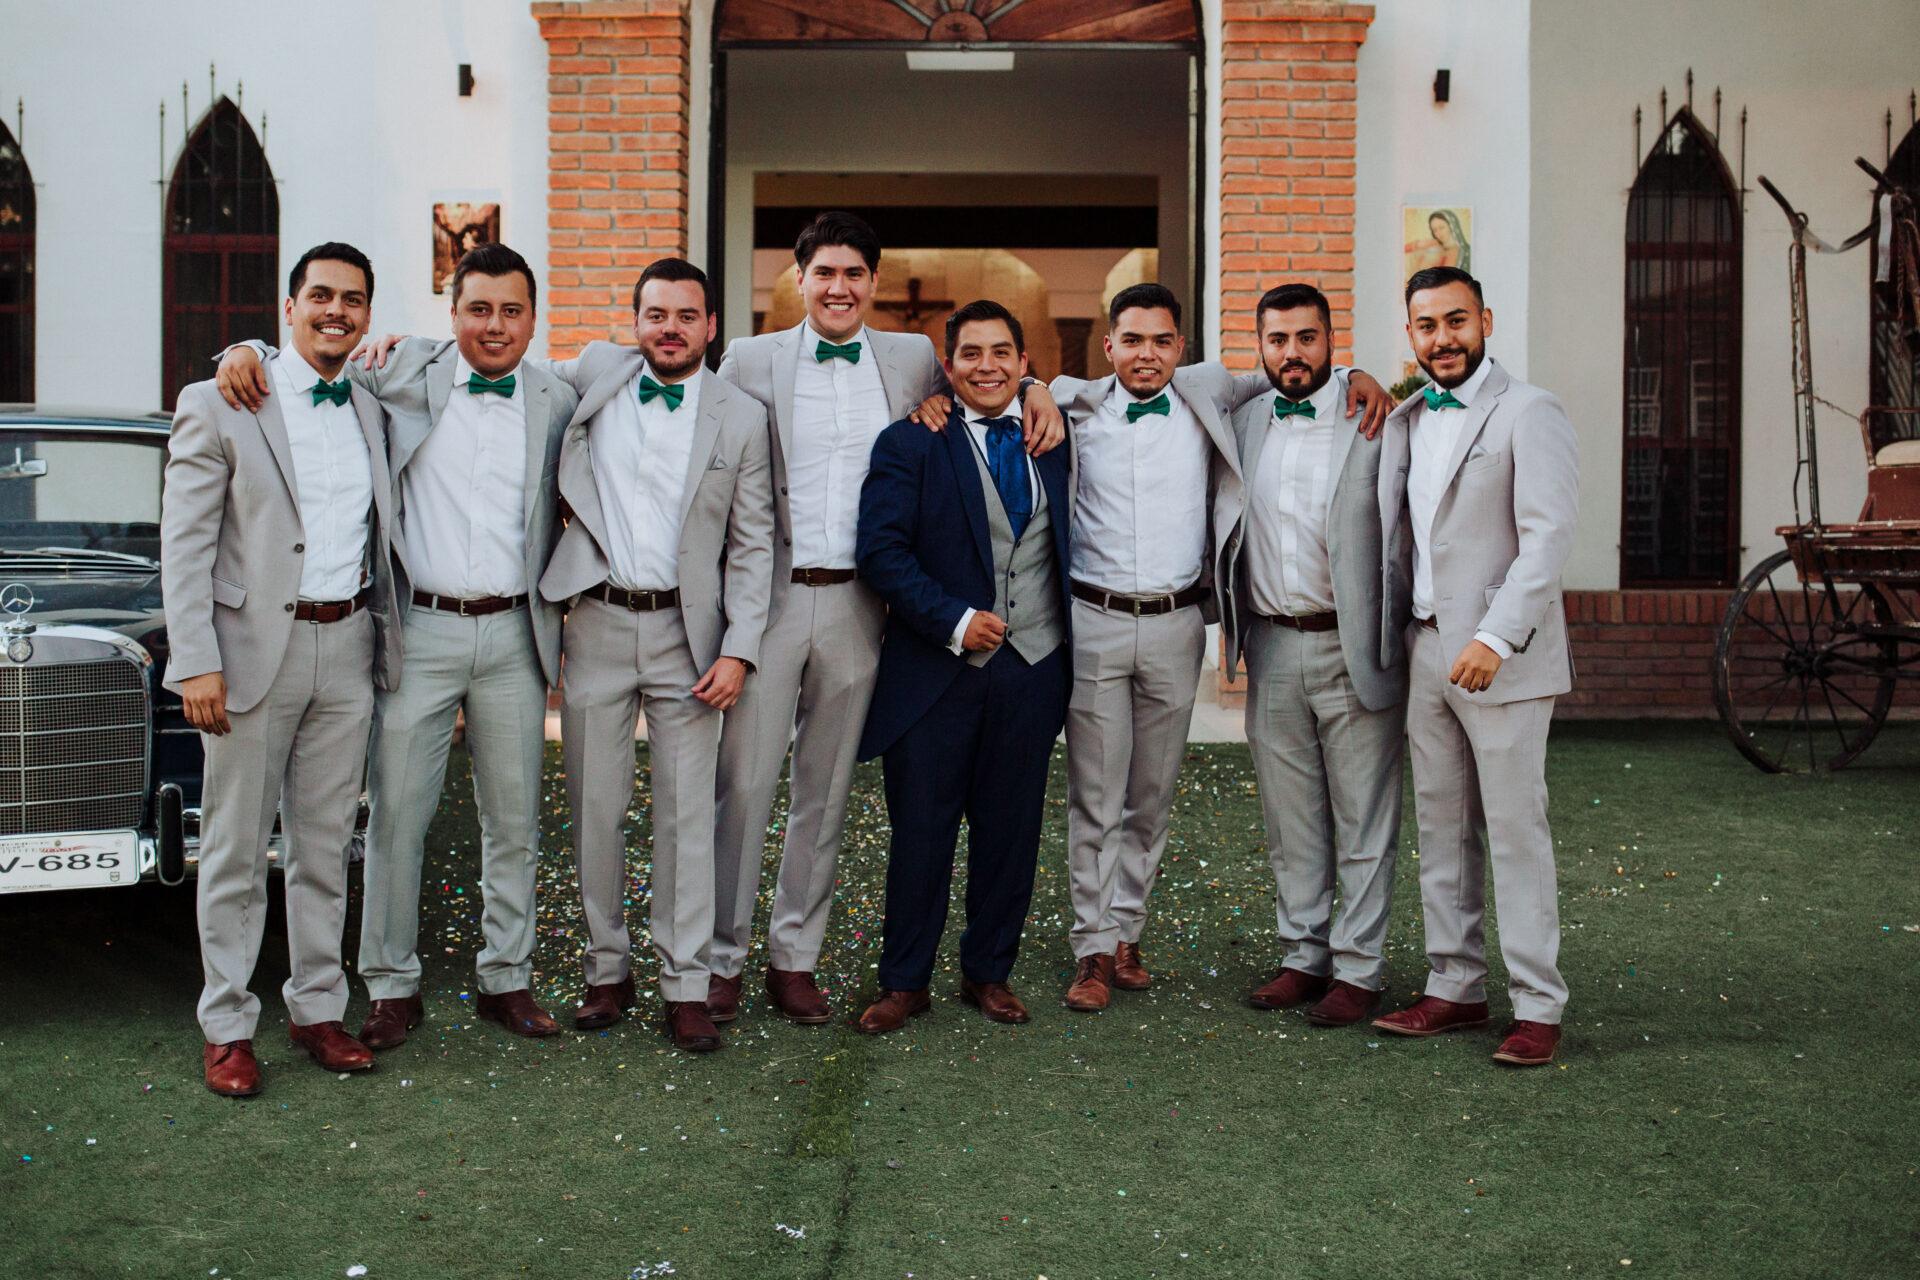 javier_noriega_fotografo_bodas_torreon_coahuila_zacatecas_wedding_photographer42a